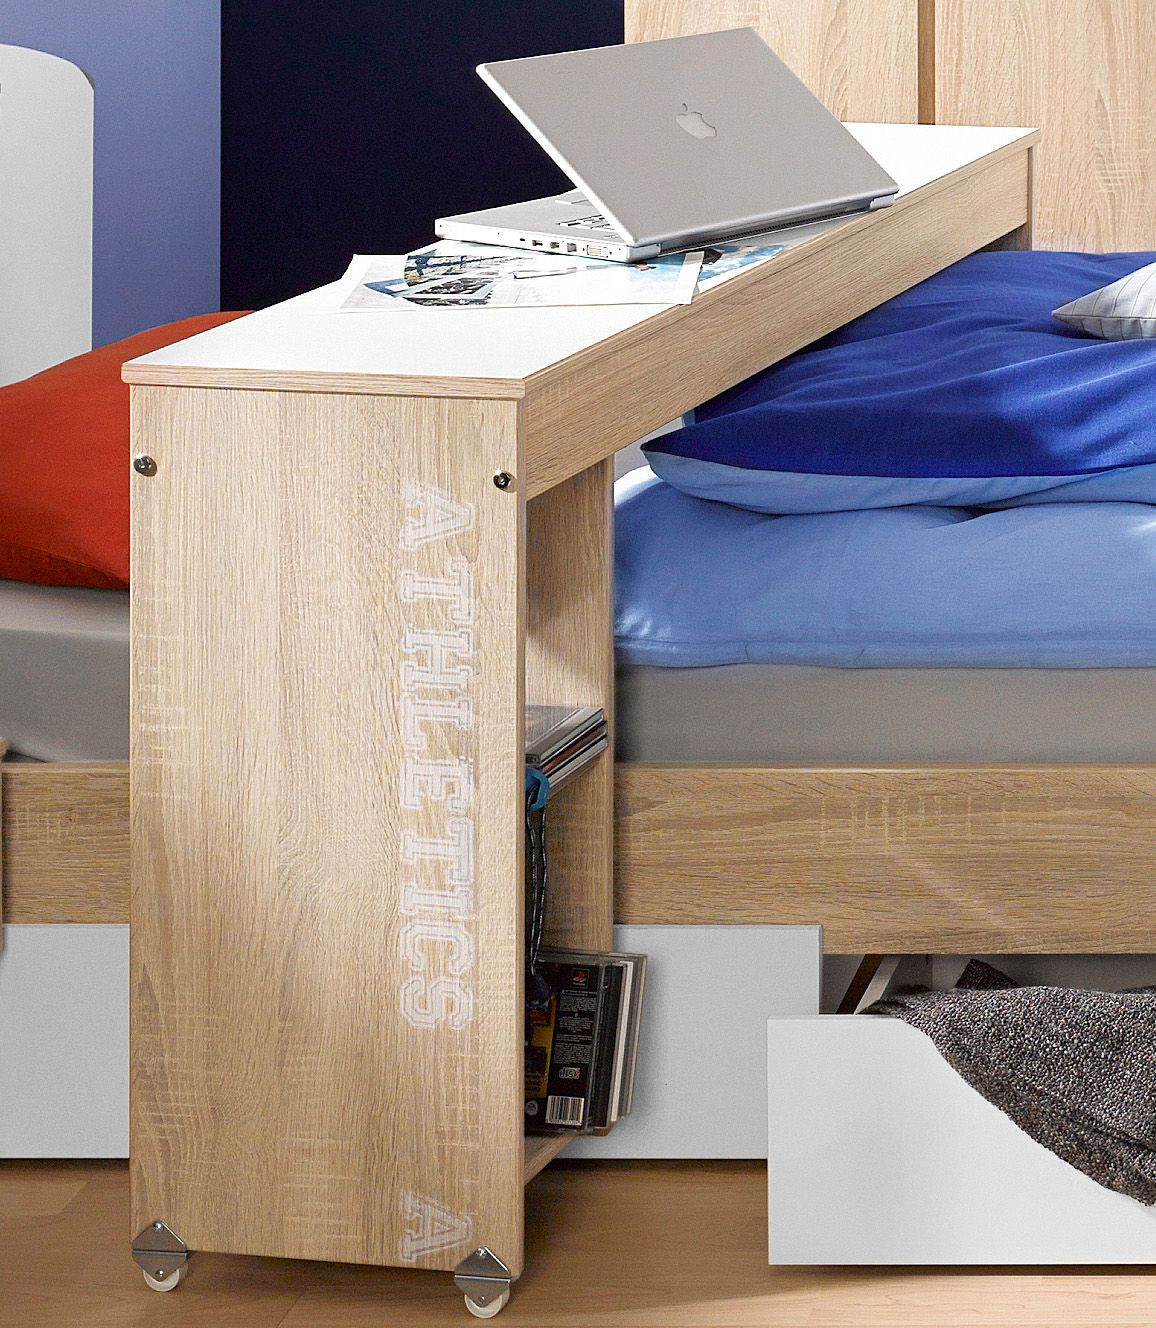 parisot bettbr cke schwab versand parisot. Black Bedroom Furniture Sets. Home Design Ideas